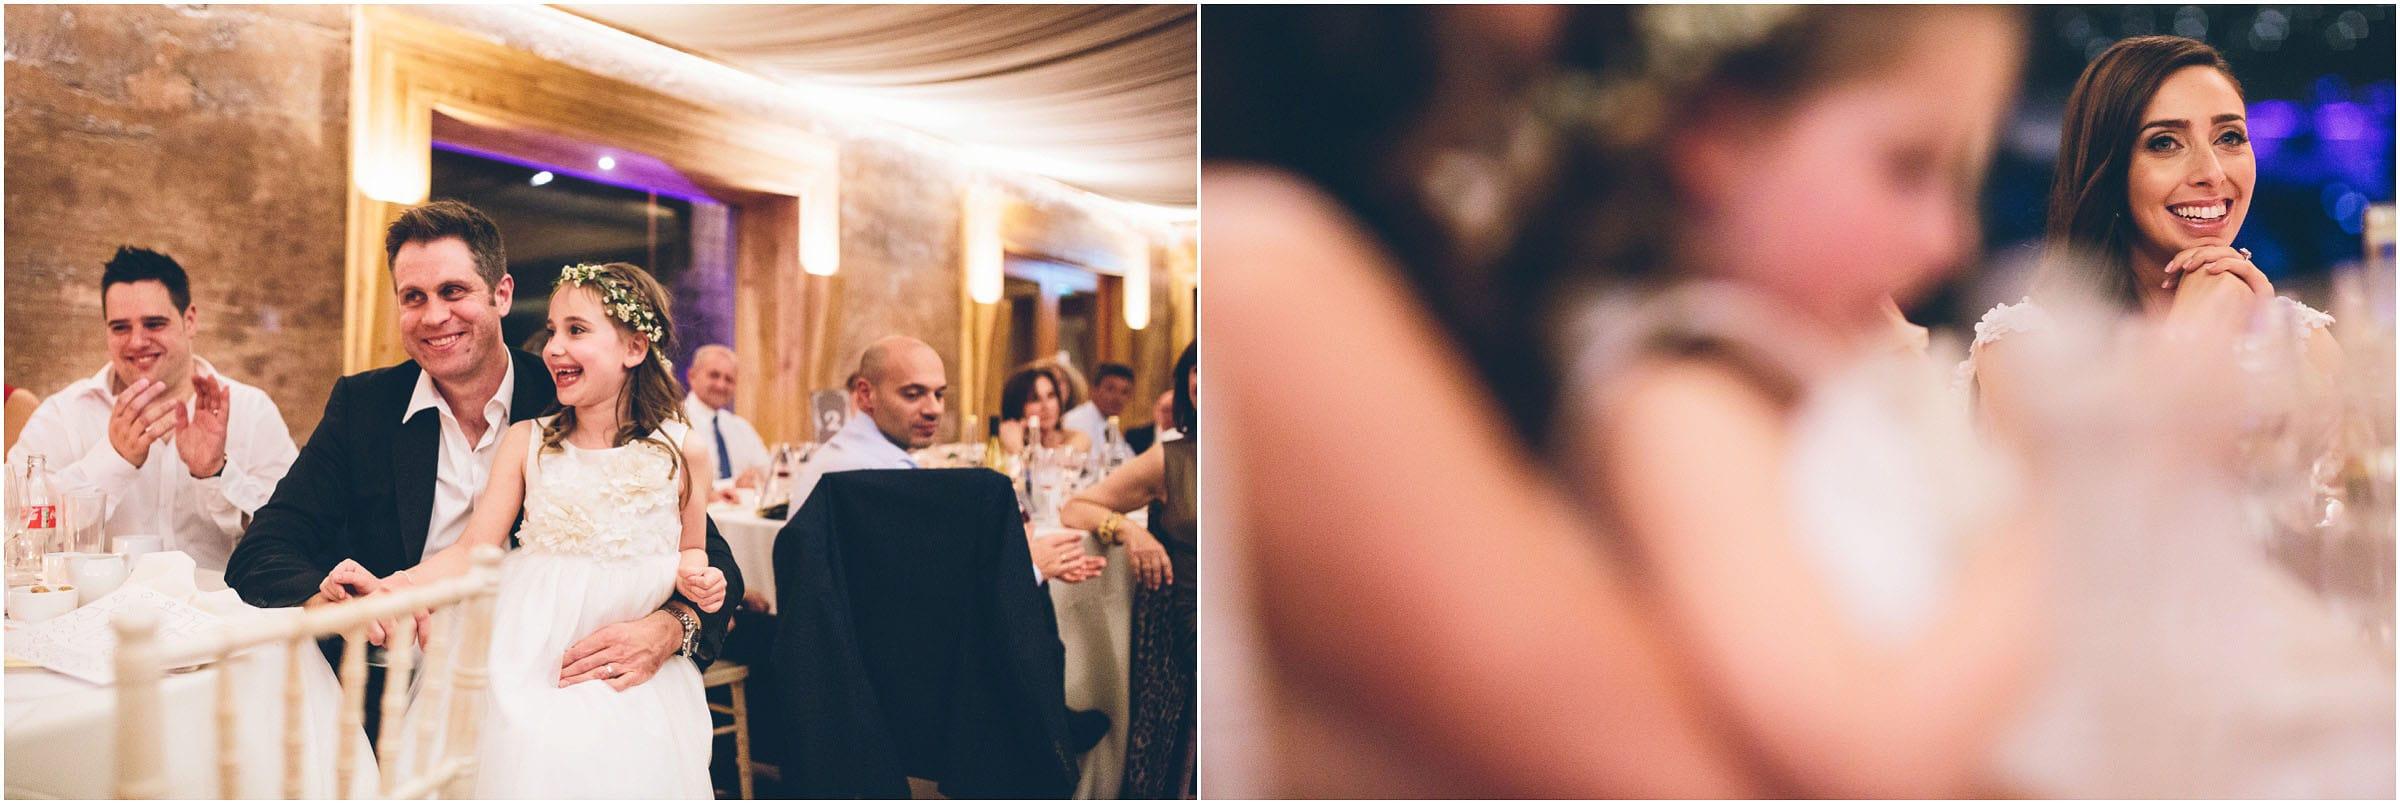 Elmore_Court_Wedding_Photography_0109